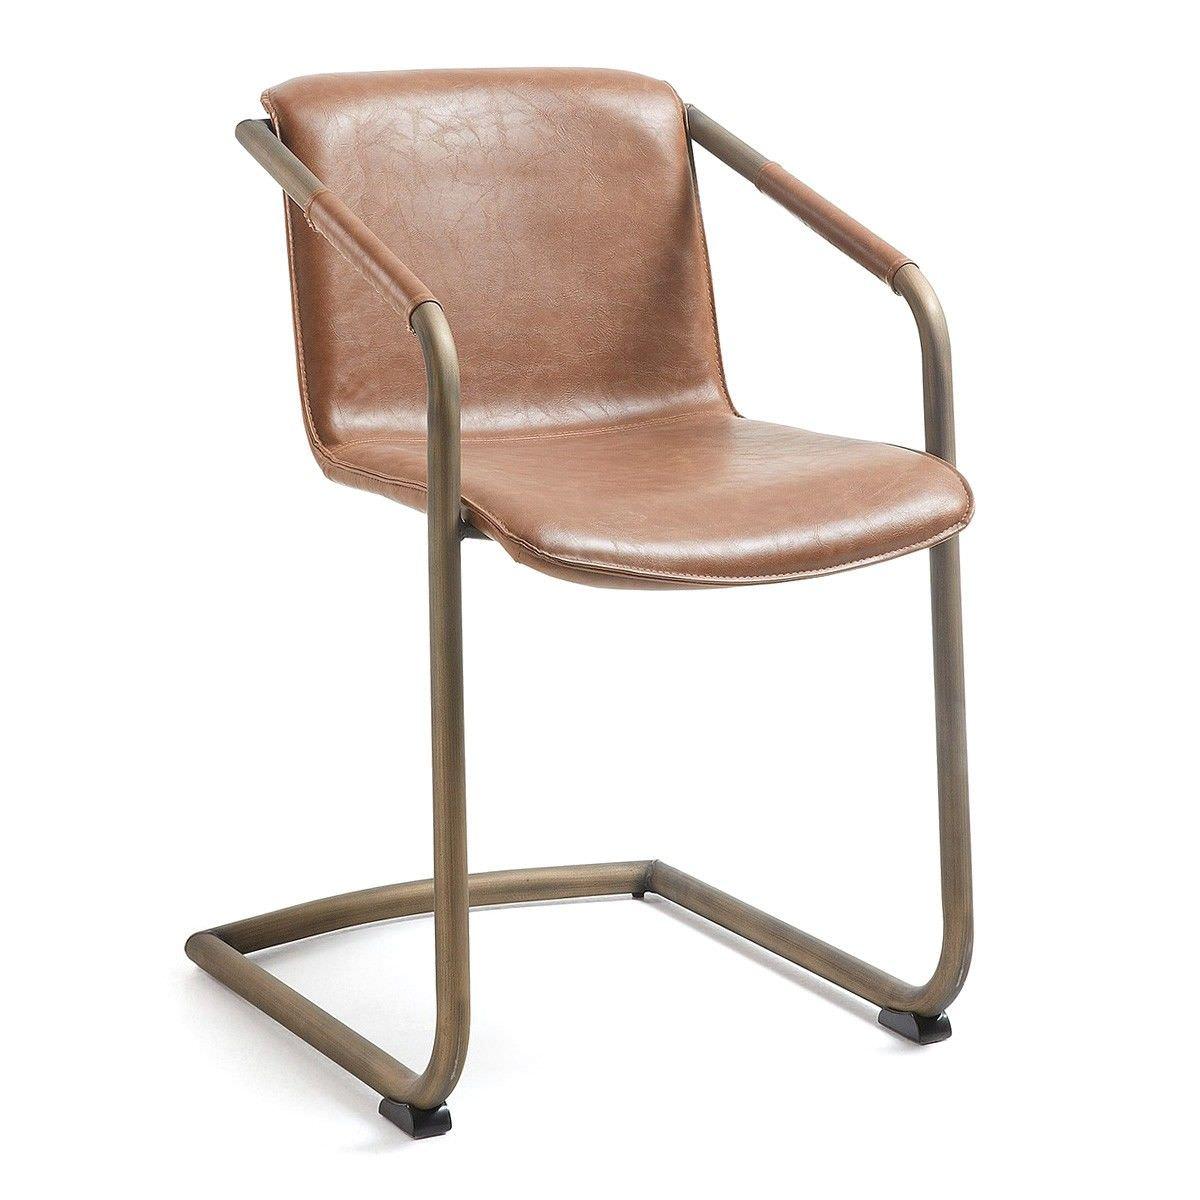 Mooney PU Leather Swing Leg Dining Armchair, Tan